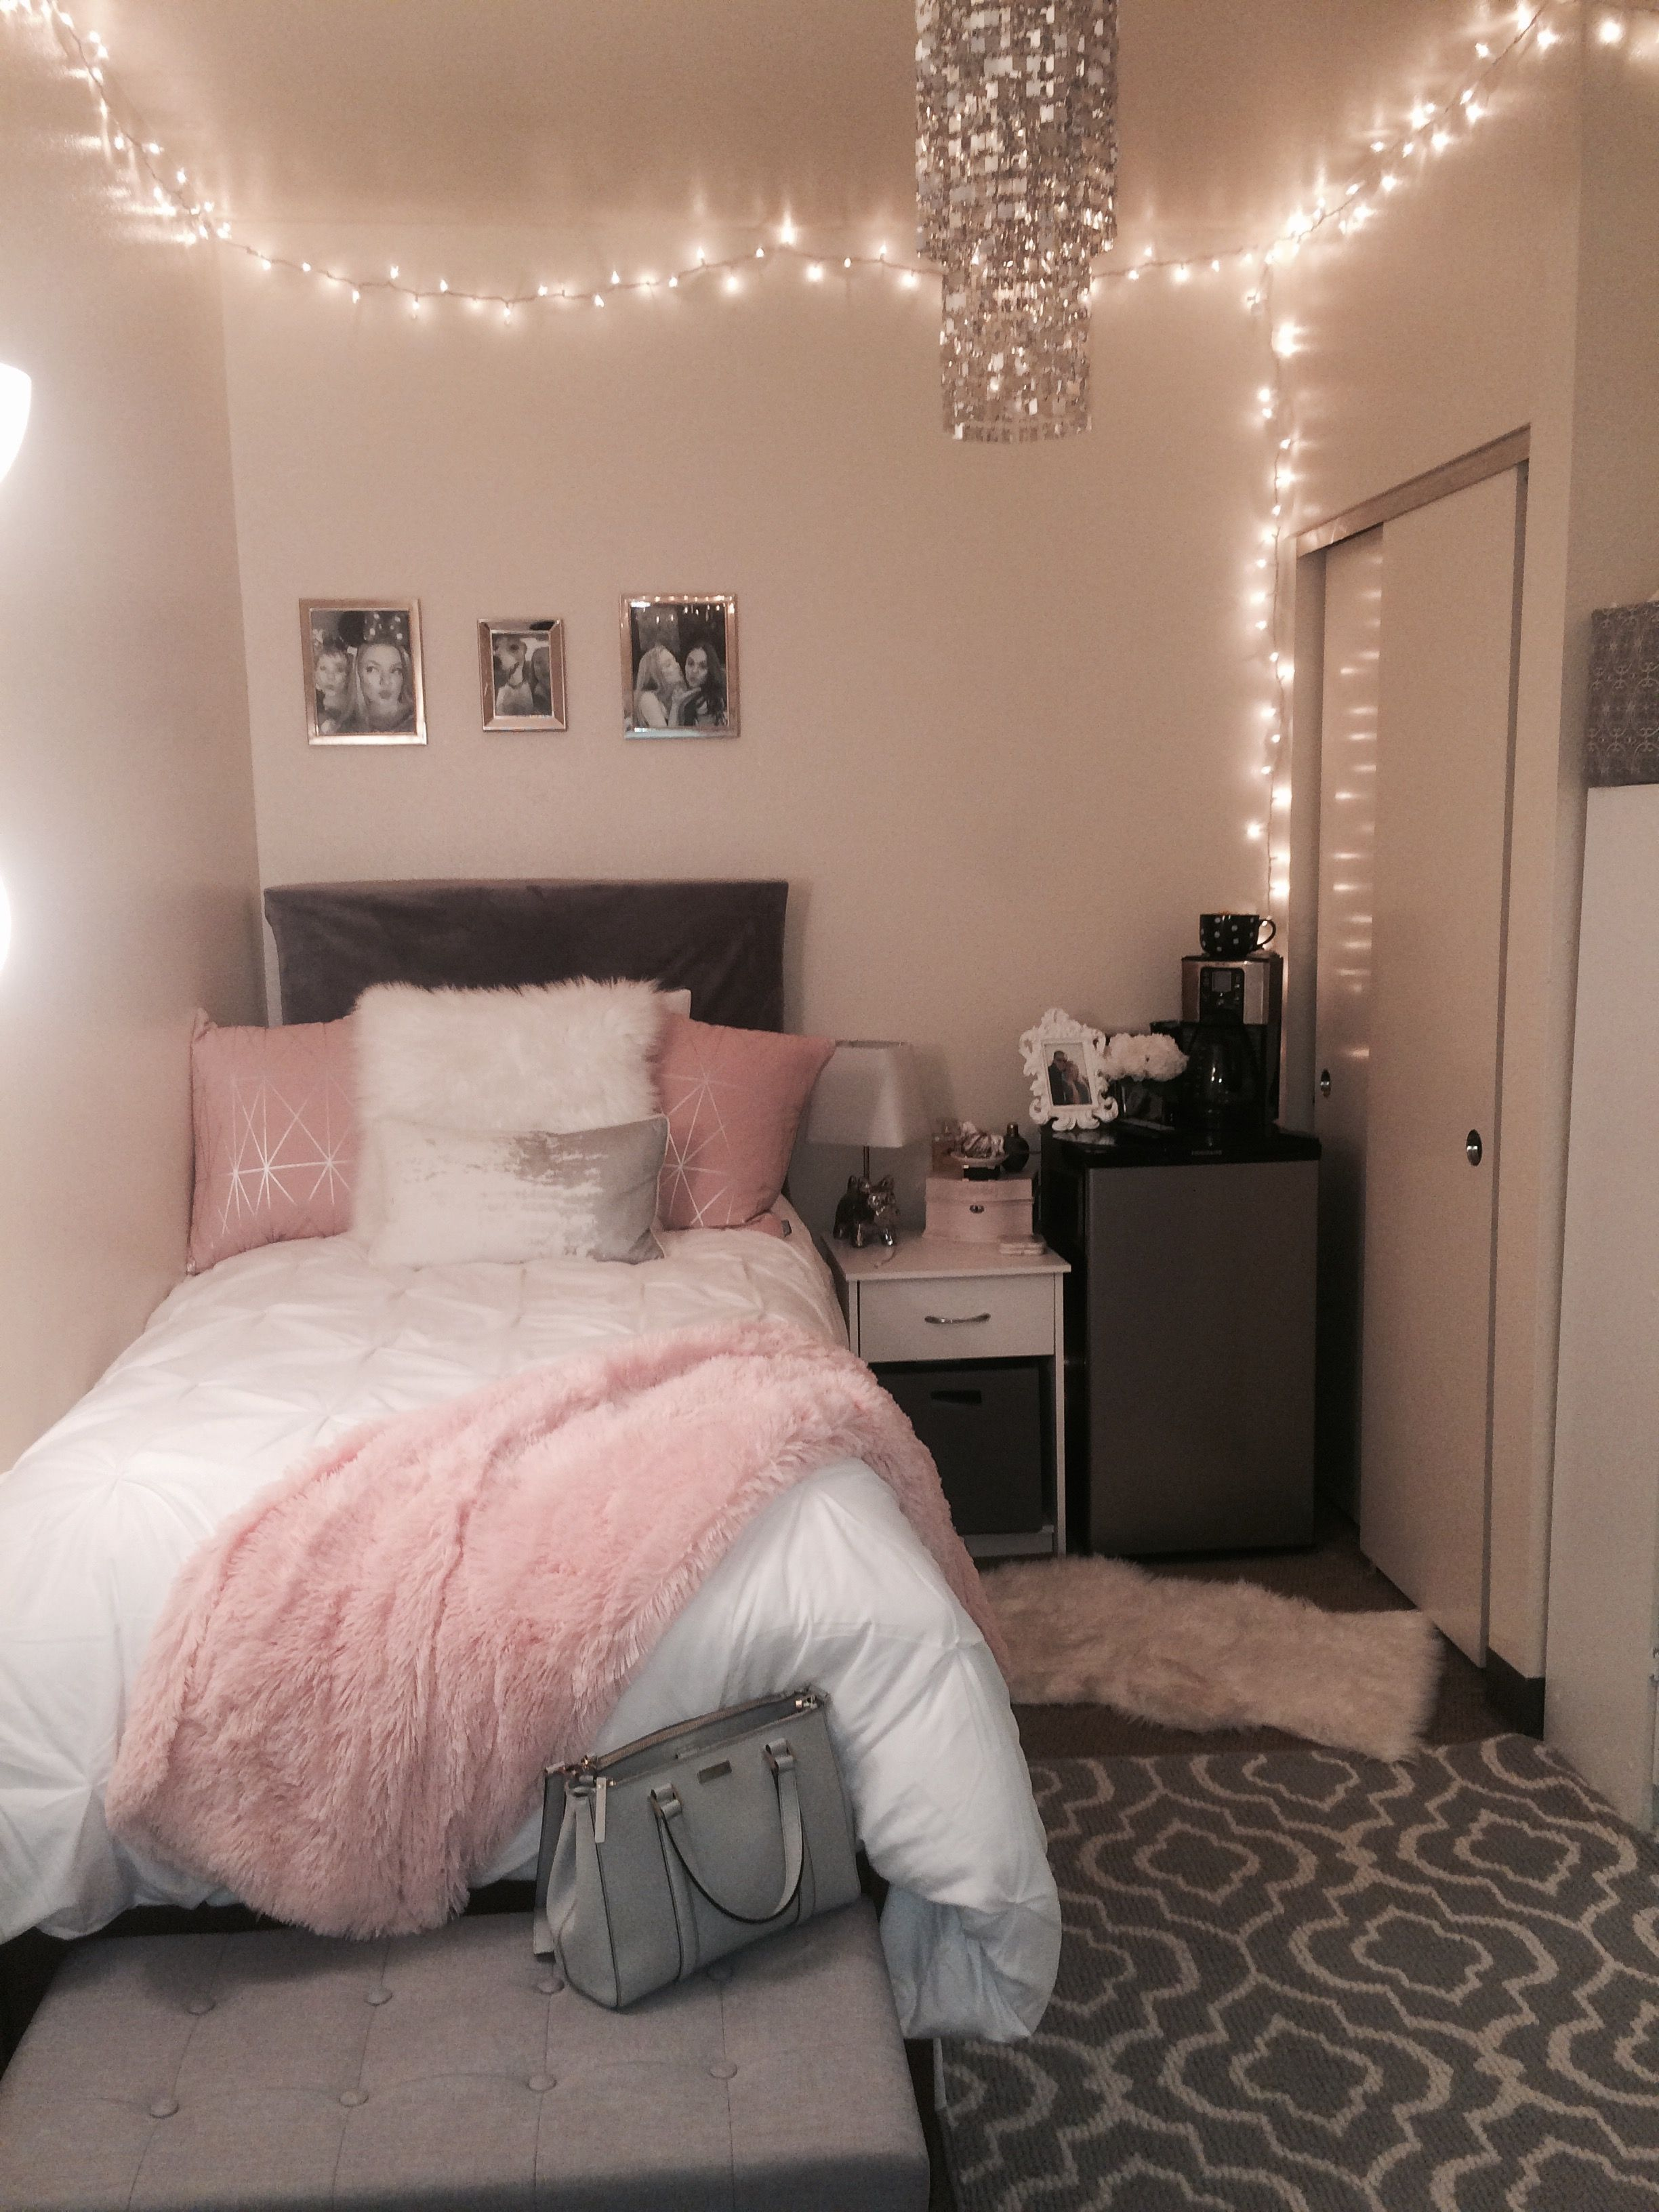 Sofia Vergara Collection  Dorm room decor, Small room bedroom